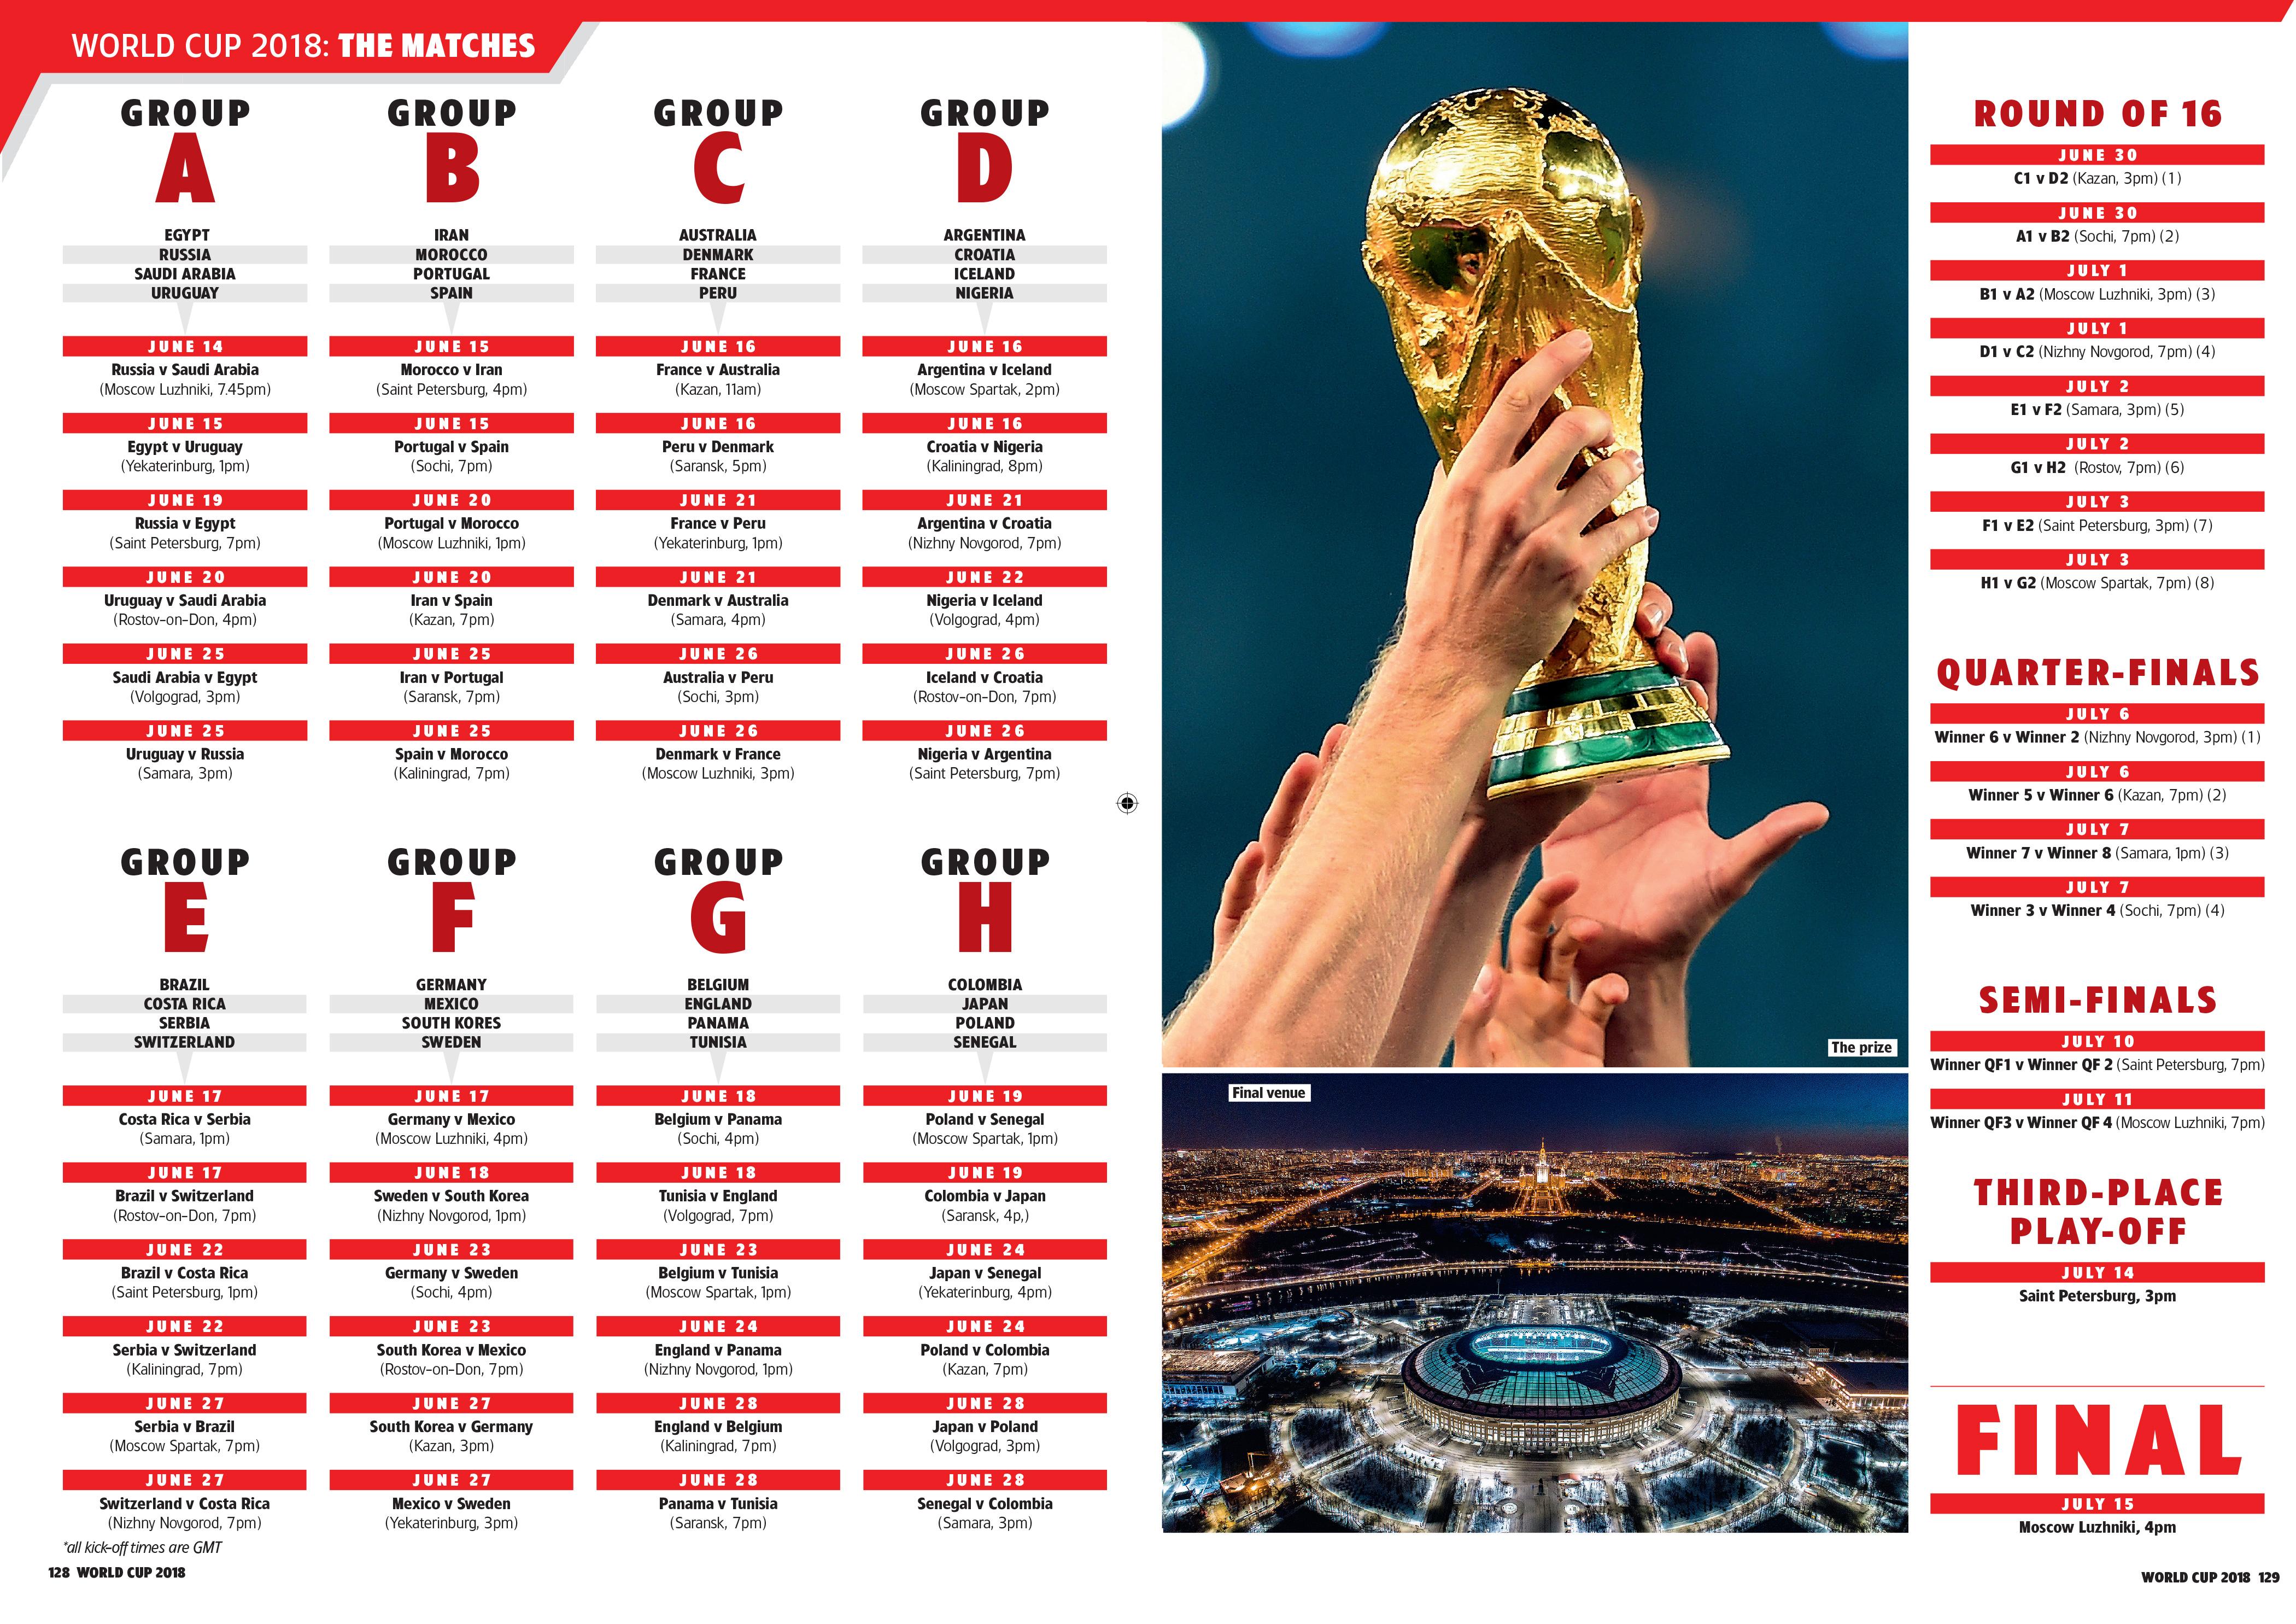 World Cup 2018: Schedule